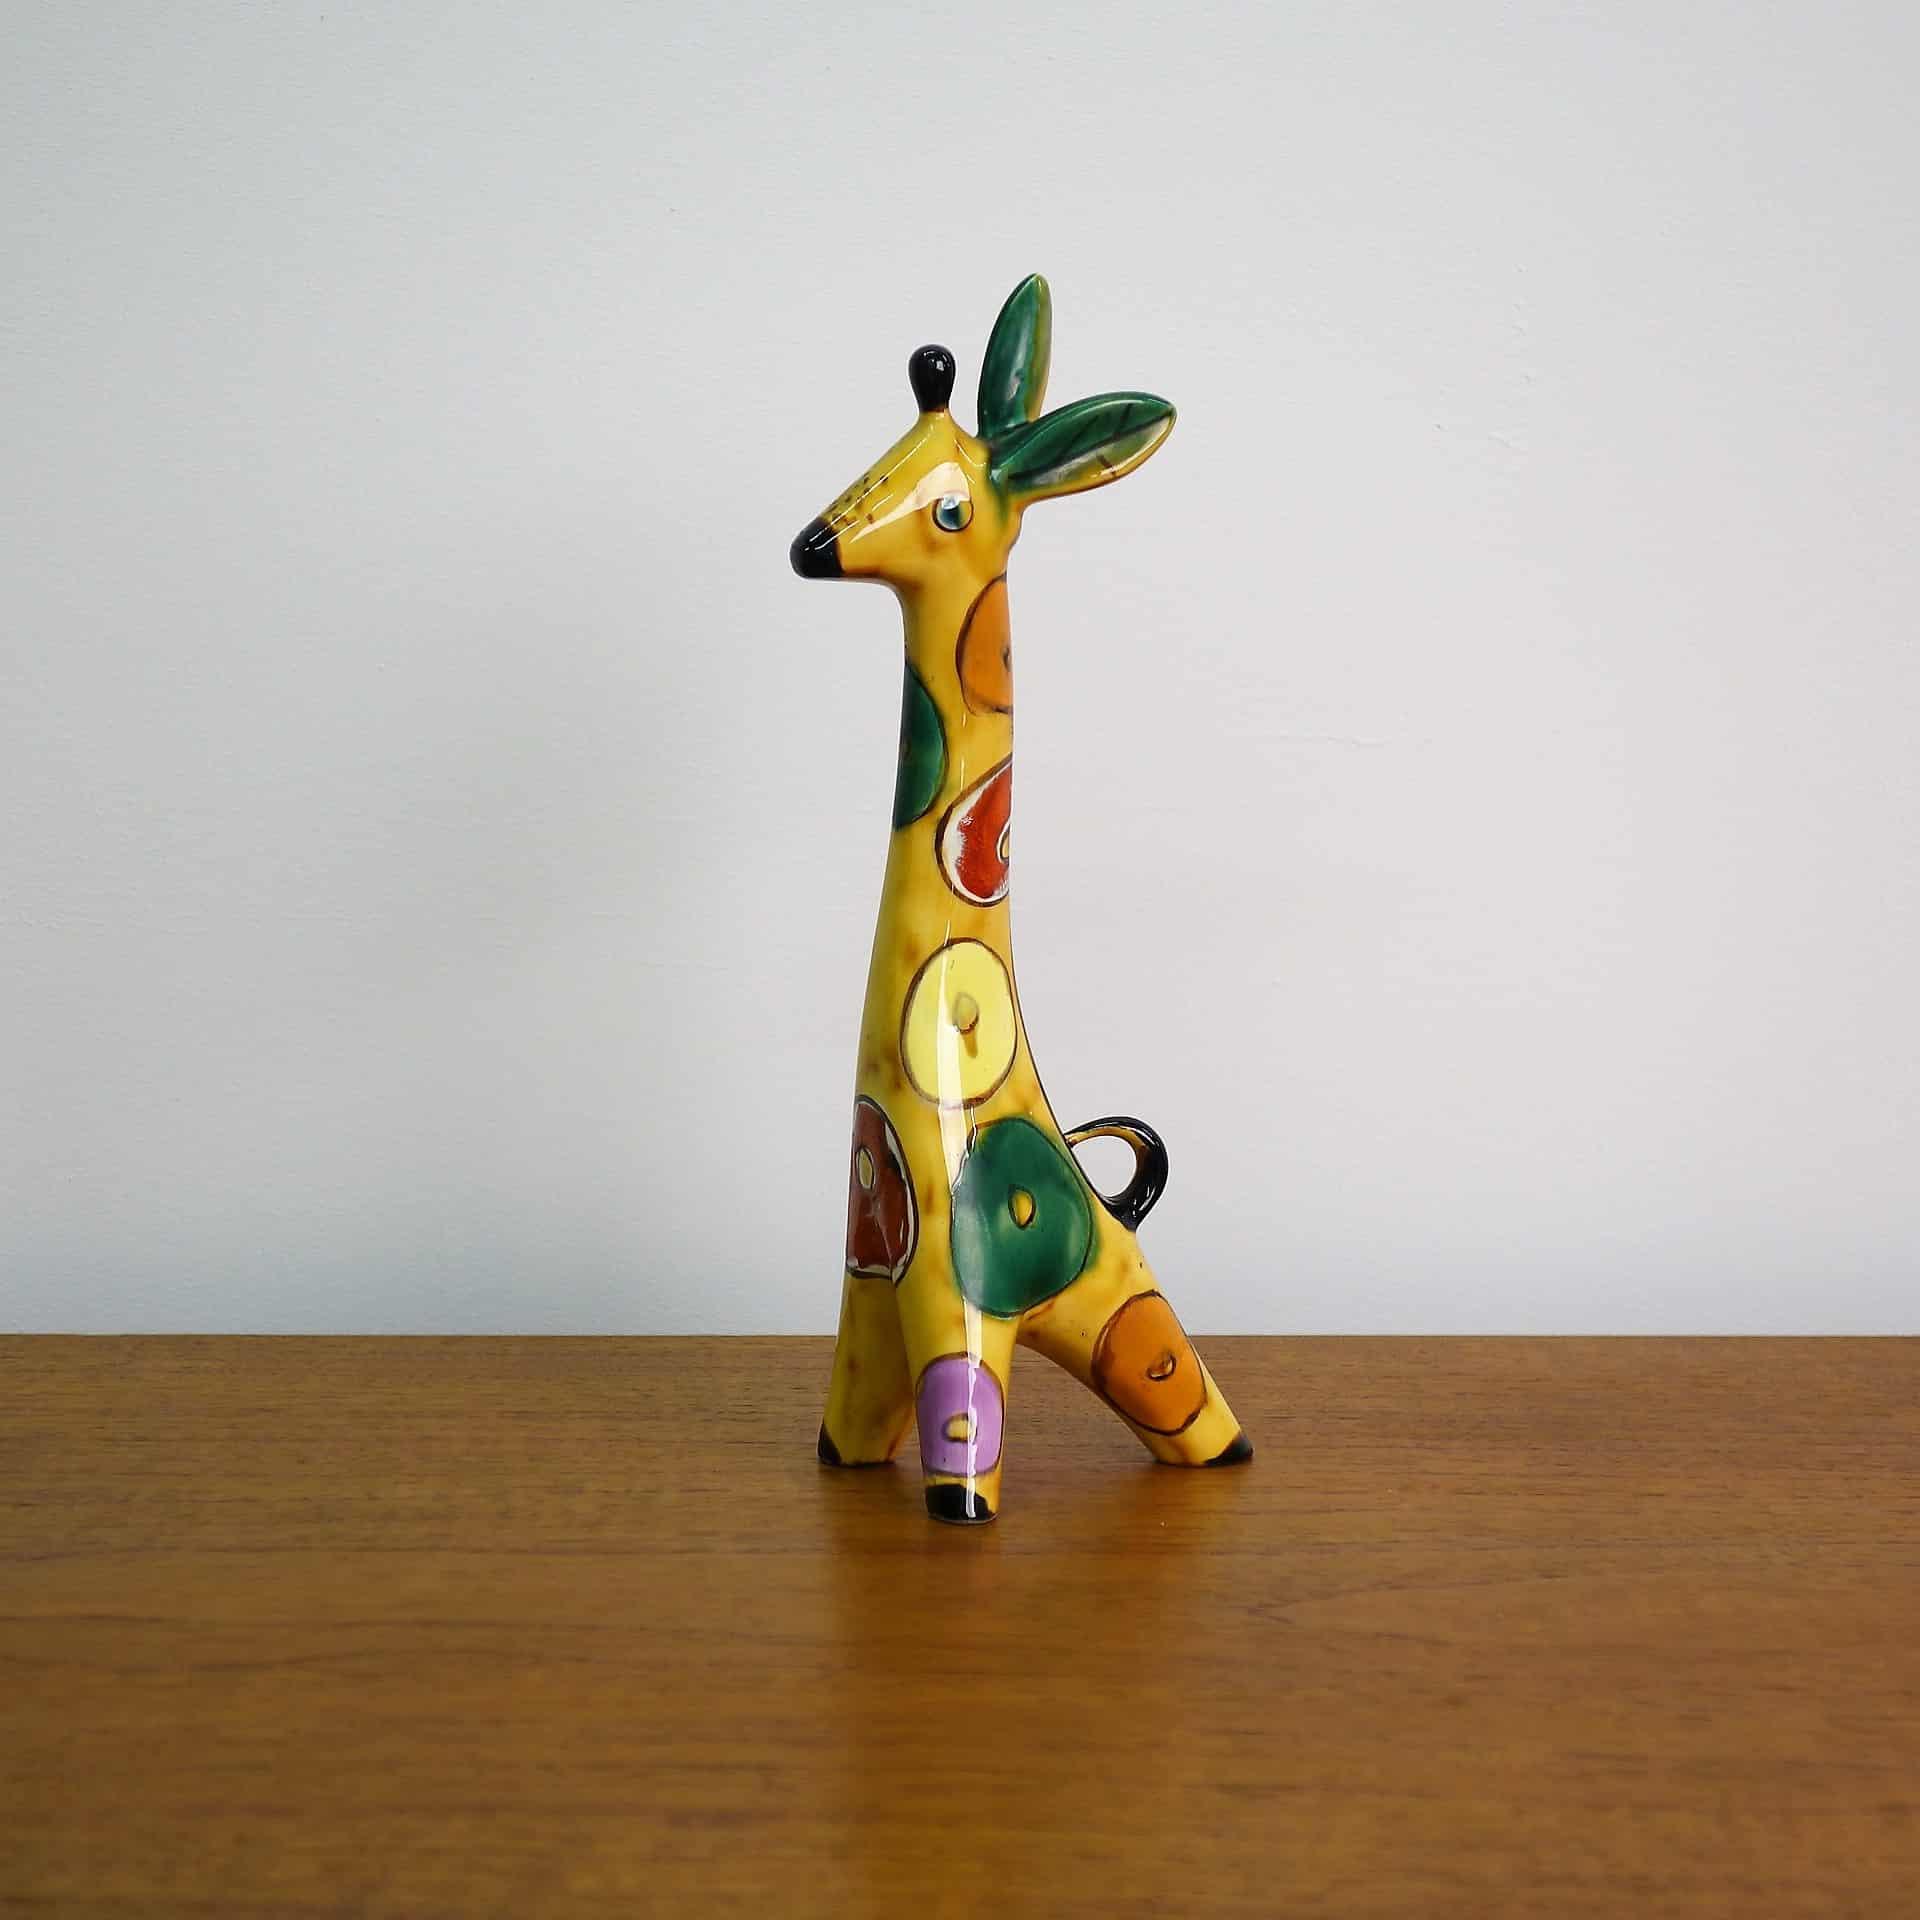 1960s ceramic giraffe made in the USSR